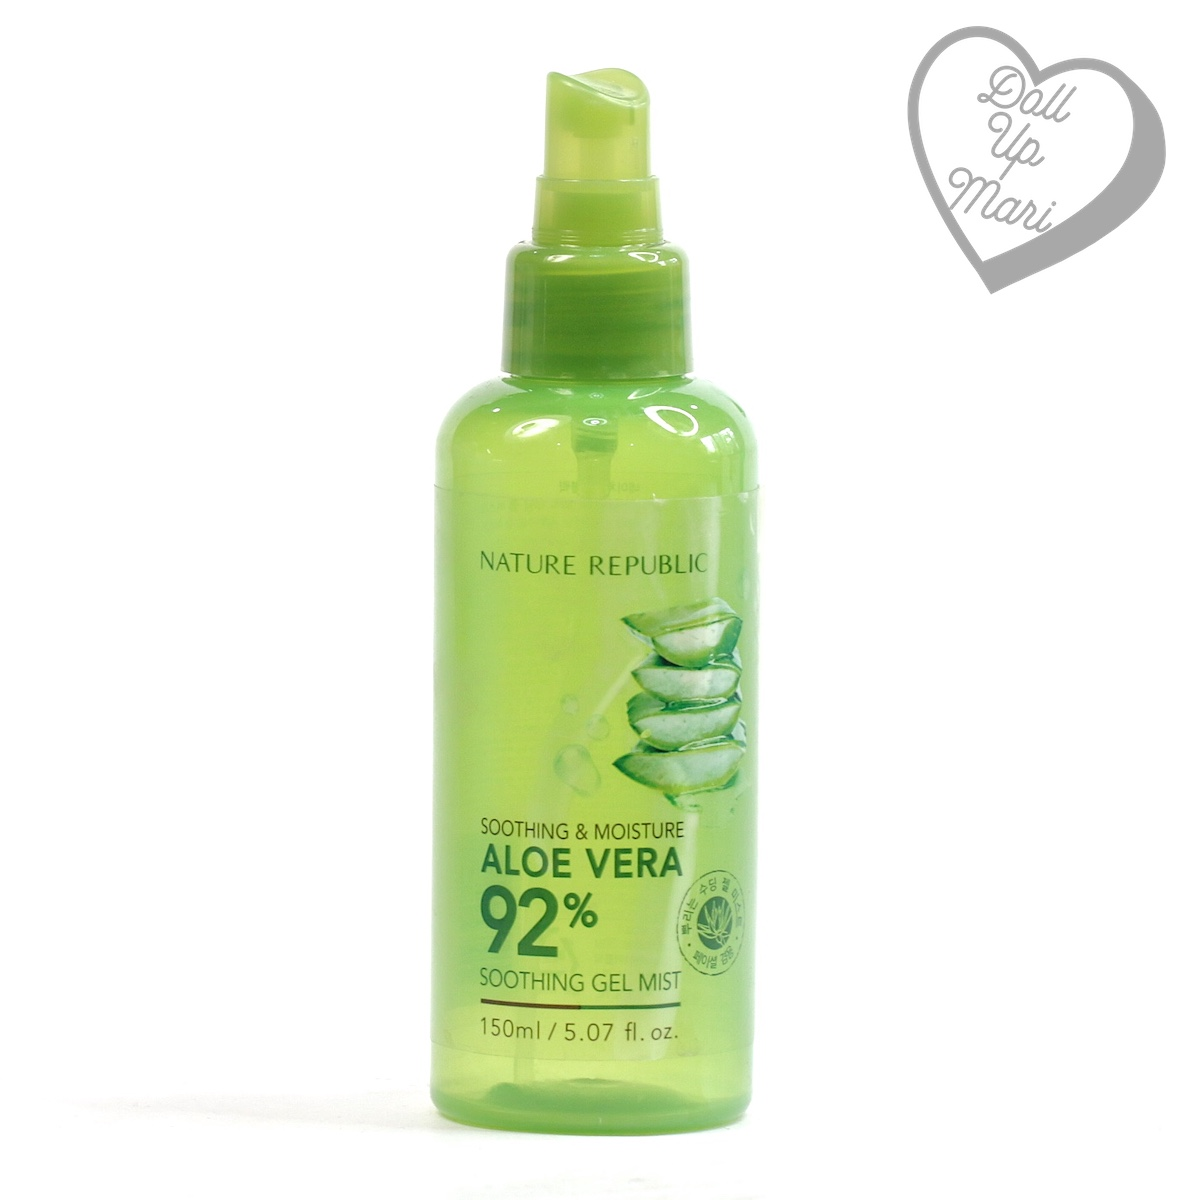 Nature Republic Aloe Vera 92% Gel Mist